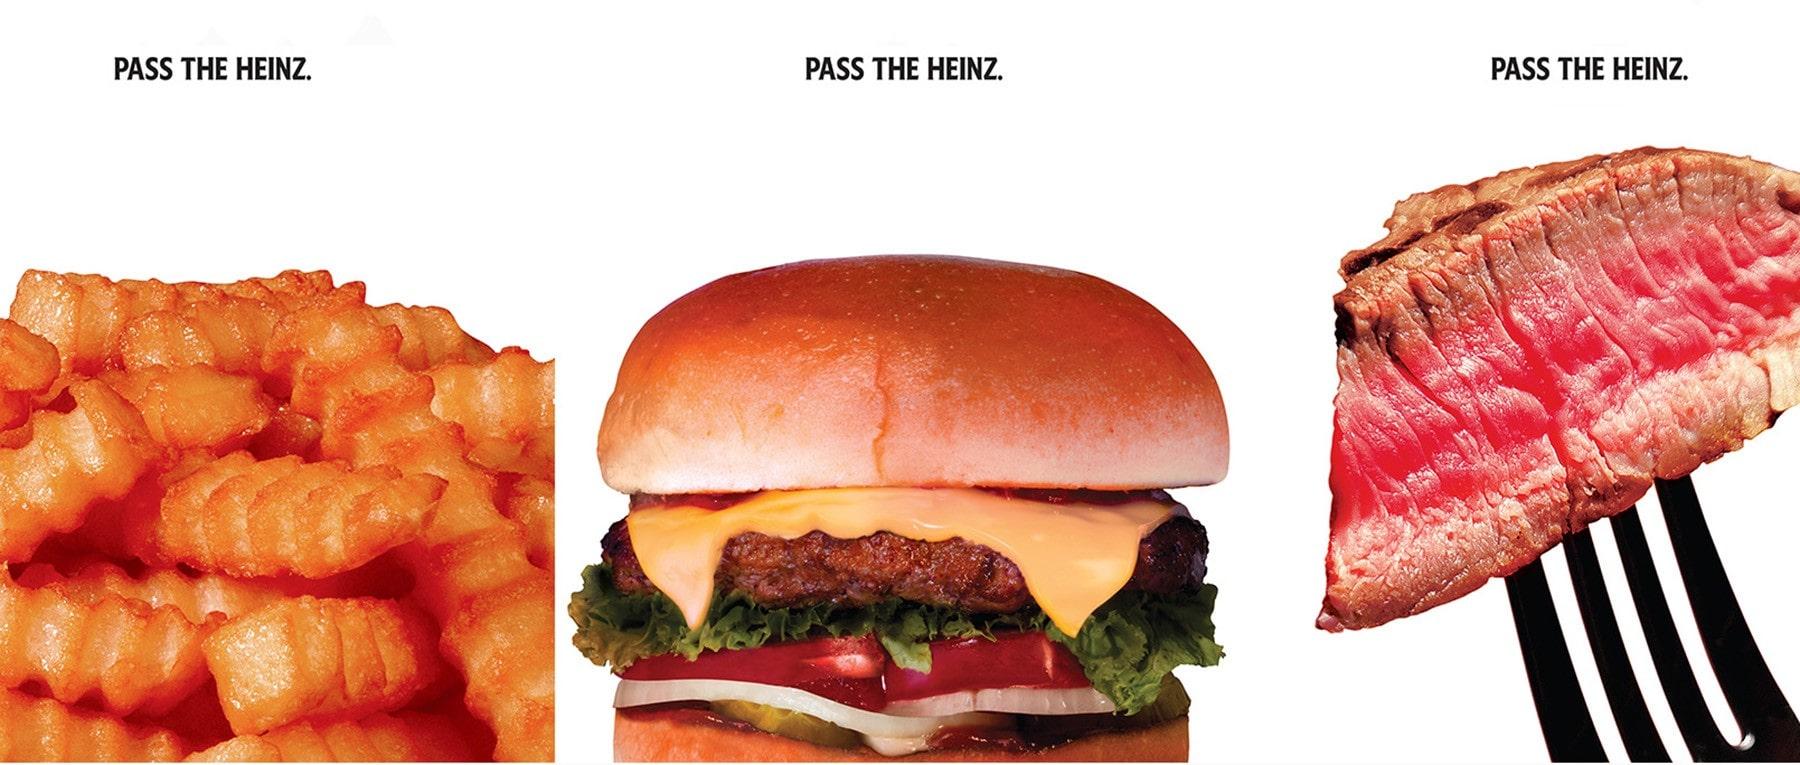 Don Draper's 'Pass the Heinz' ads